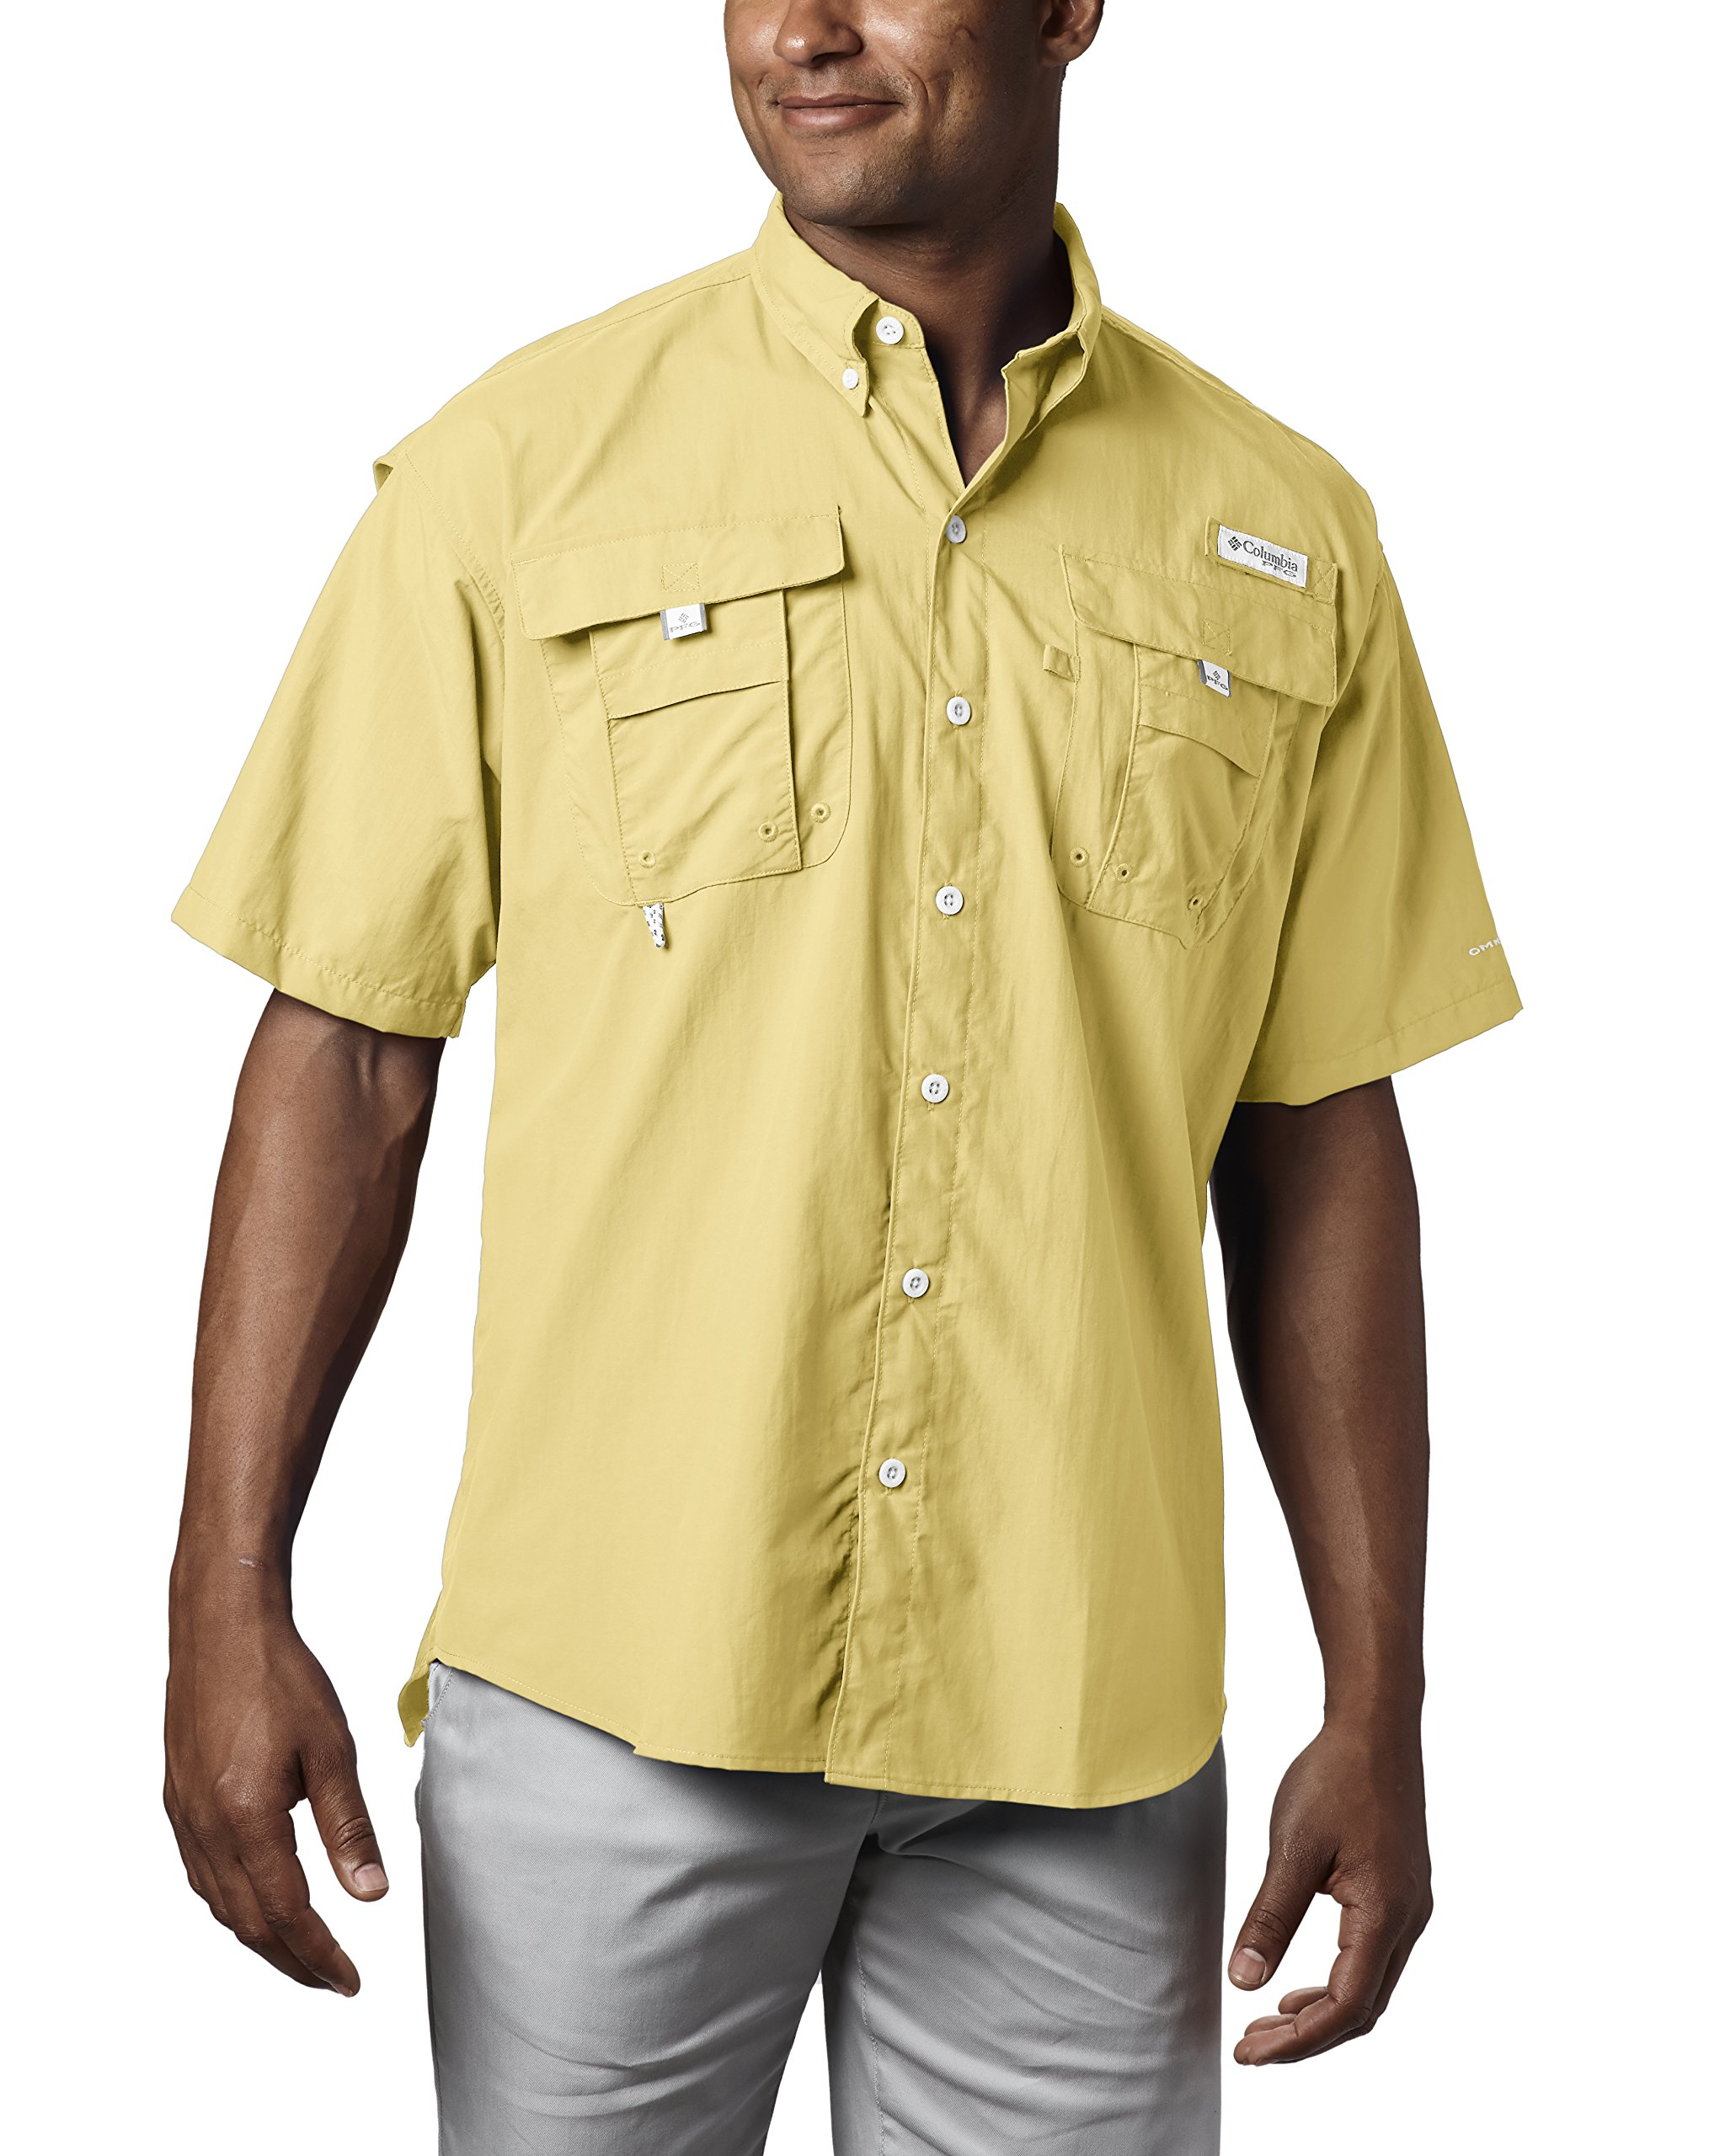 Columbia Men's PFG Bahama II Short Sleeve Shirt, Sunlit, X-Small